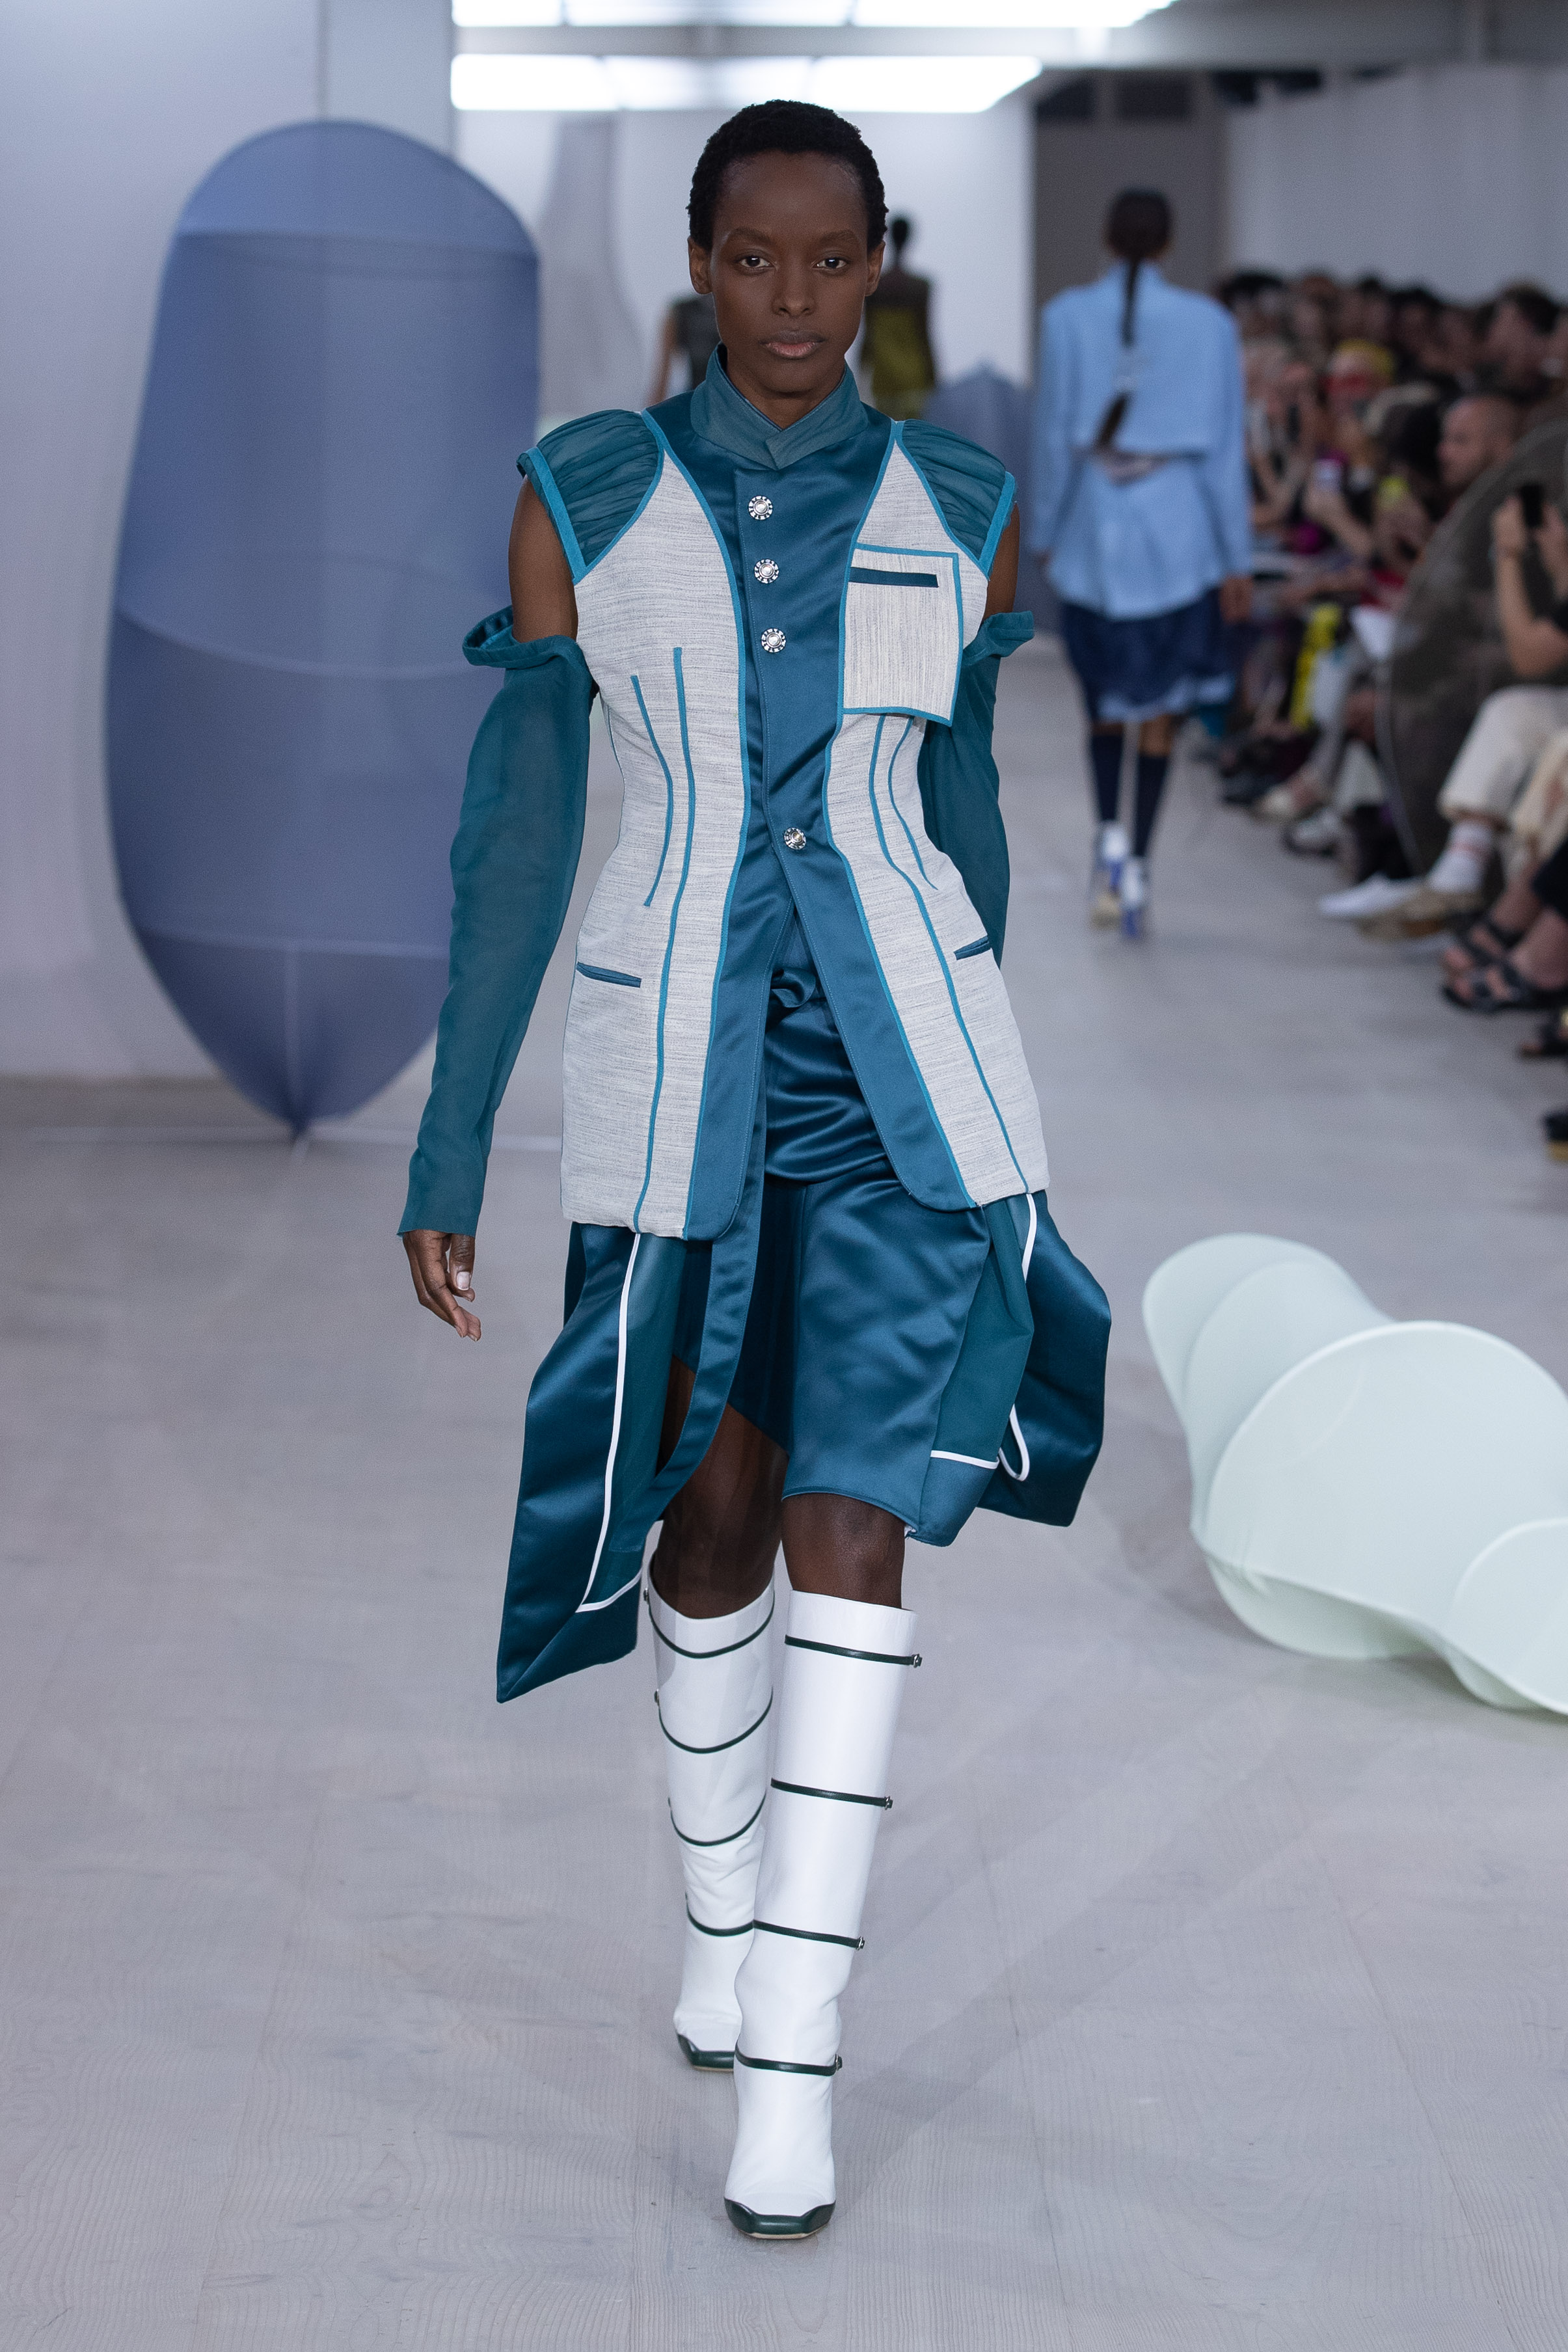 London Fashion Week Spring Summer 2020  – Richard Malone